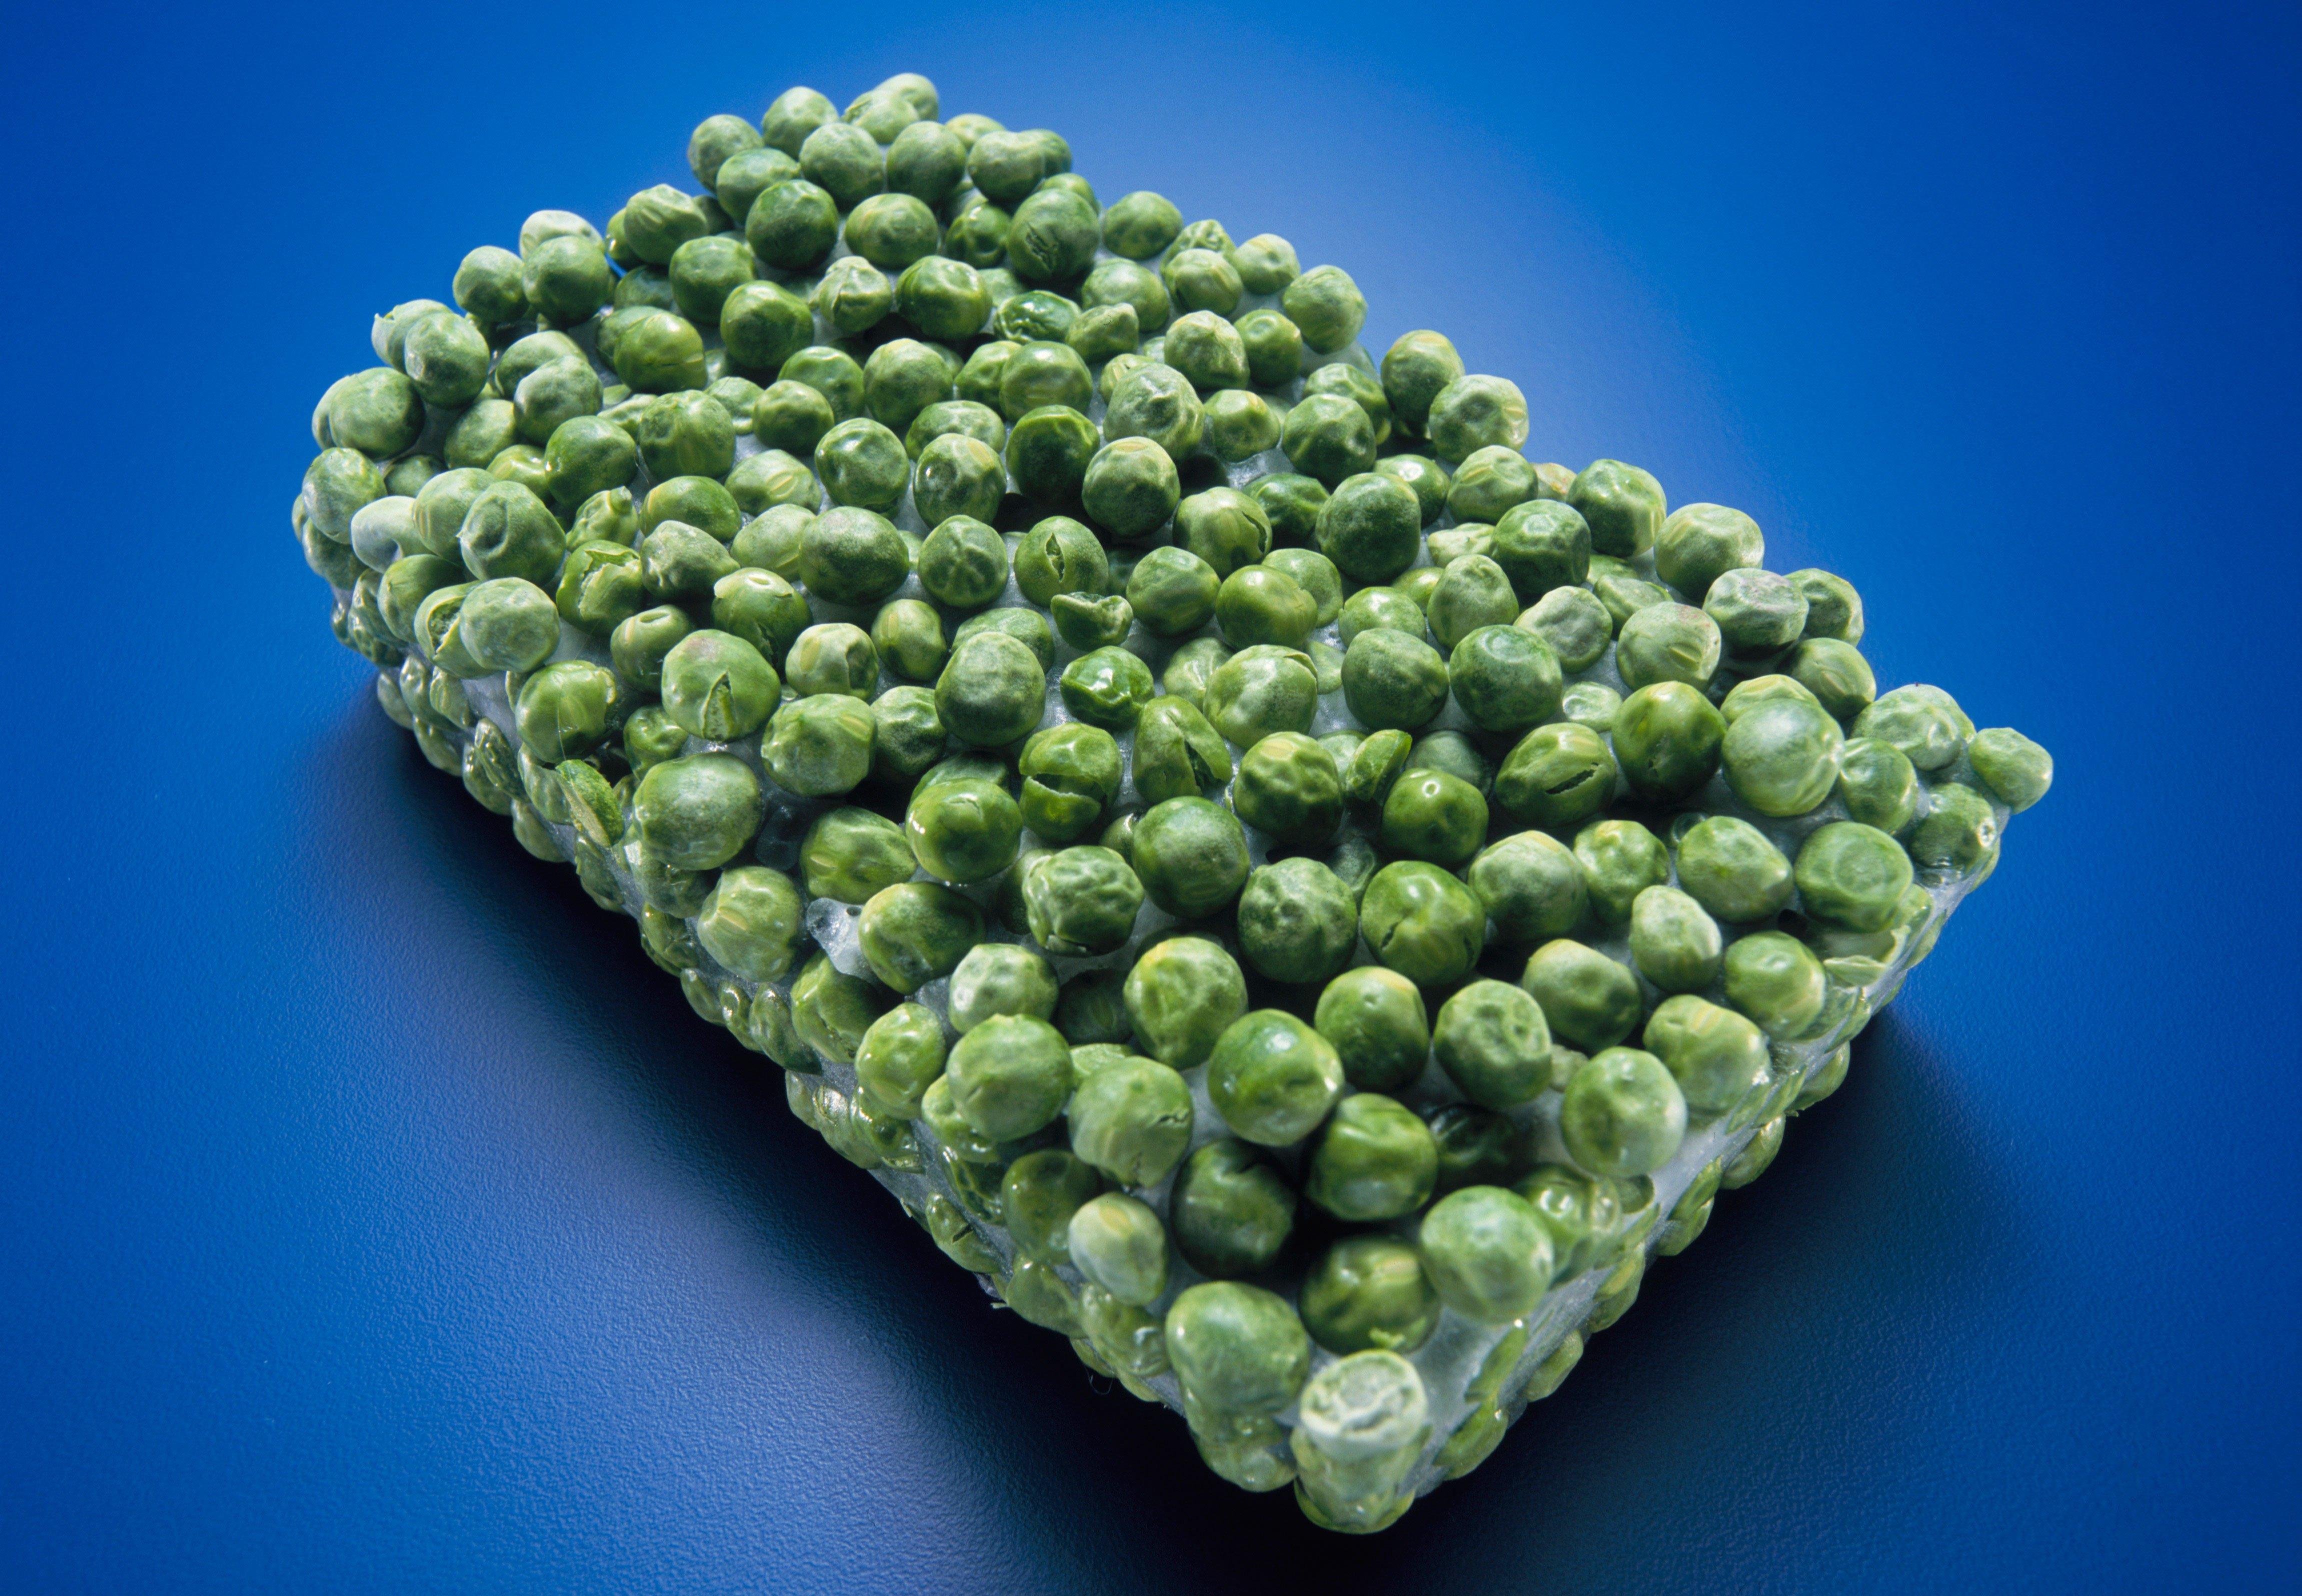 Guisantes verdes congelados